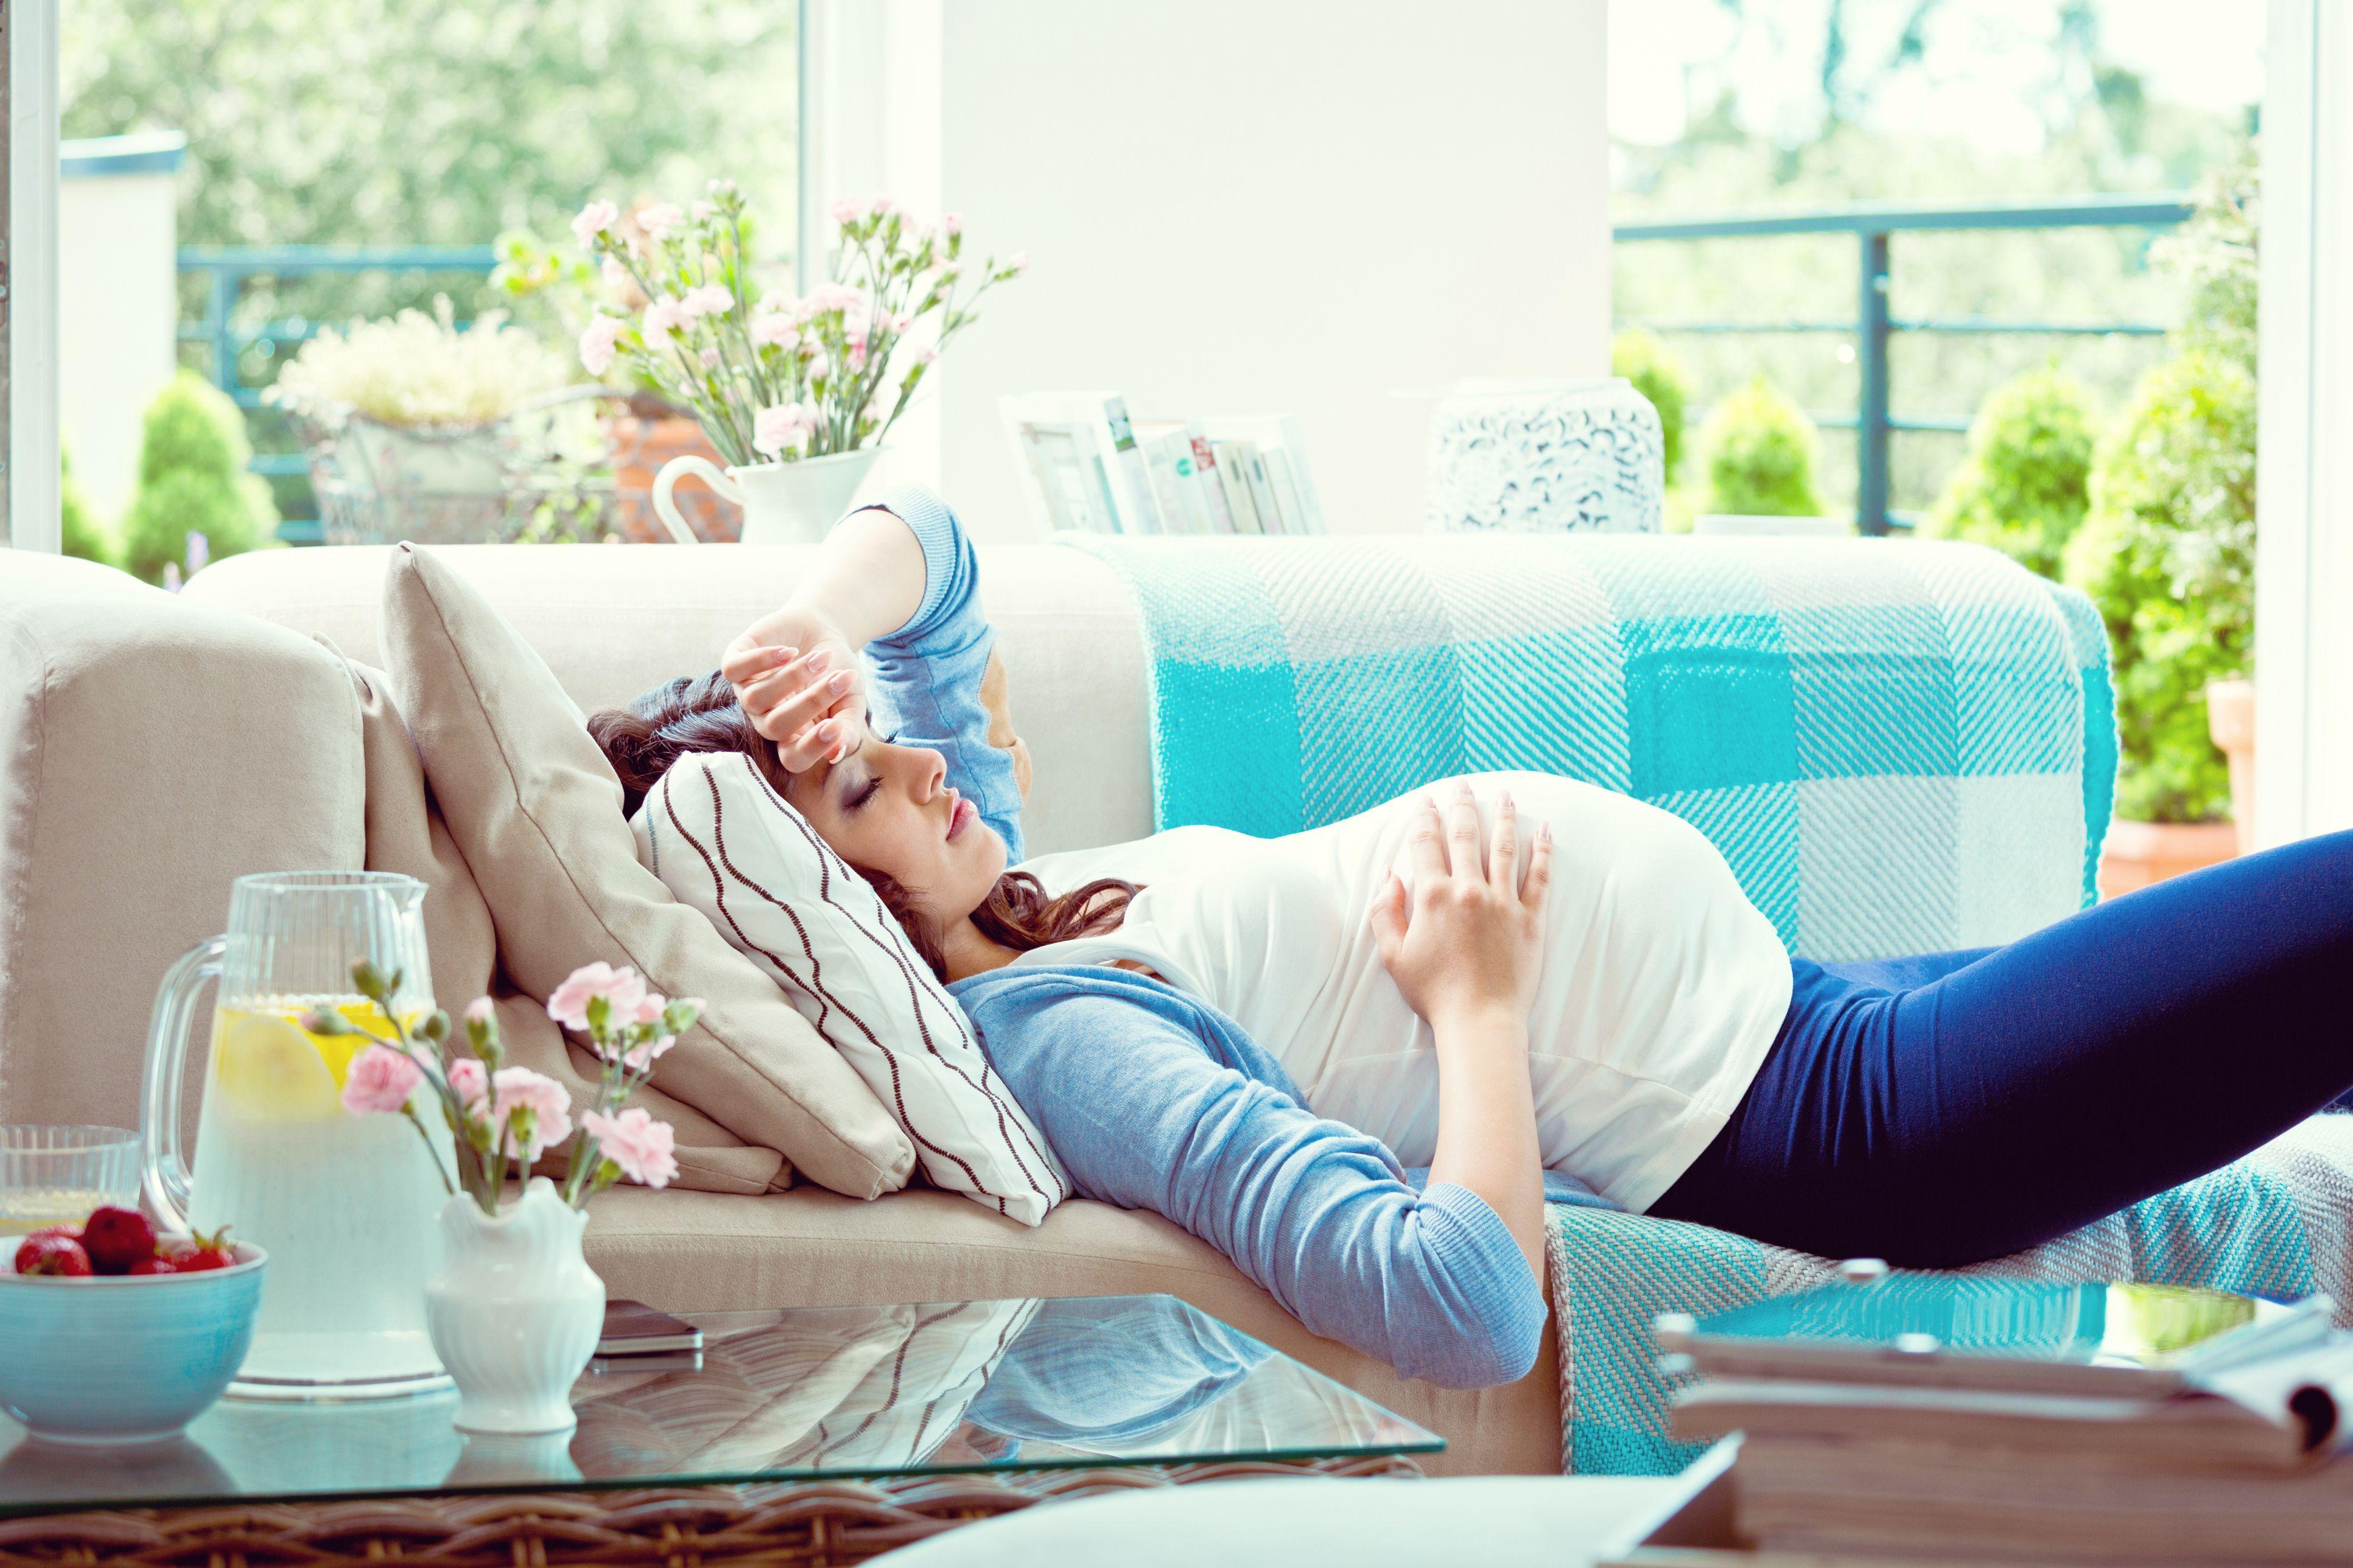 tos seca en el embarazo que tomar